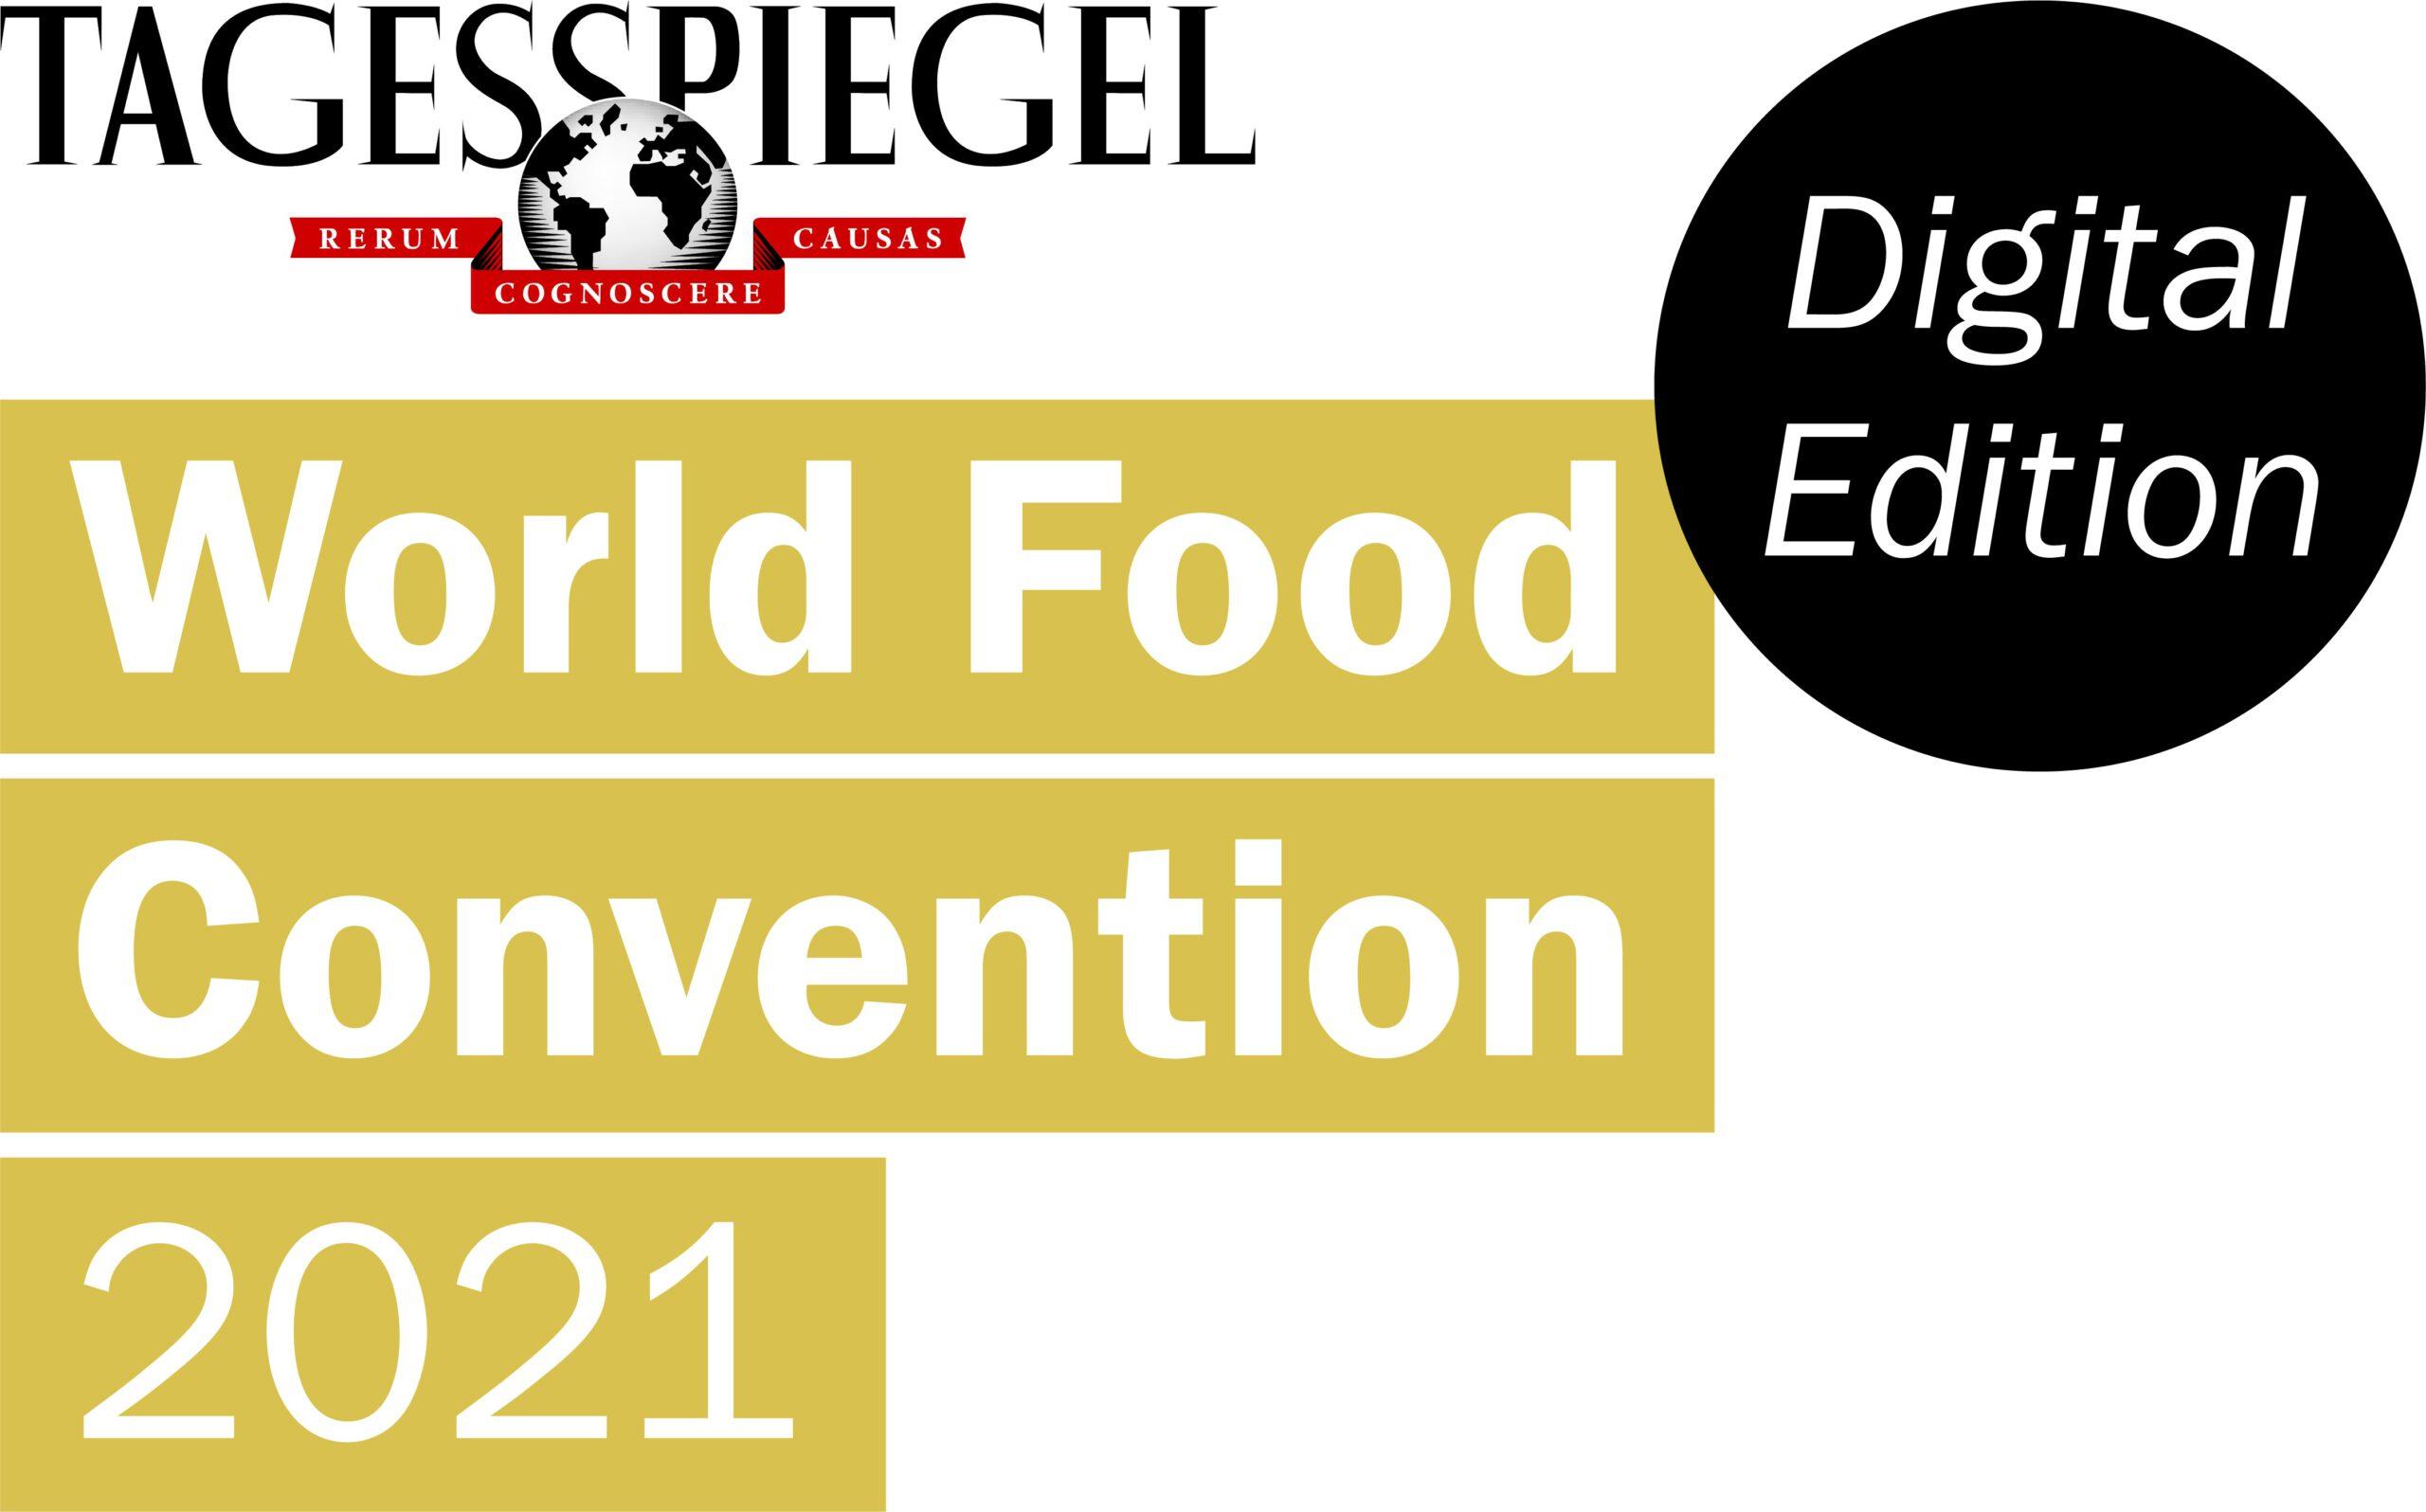 world-food-convention-2021